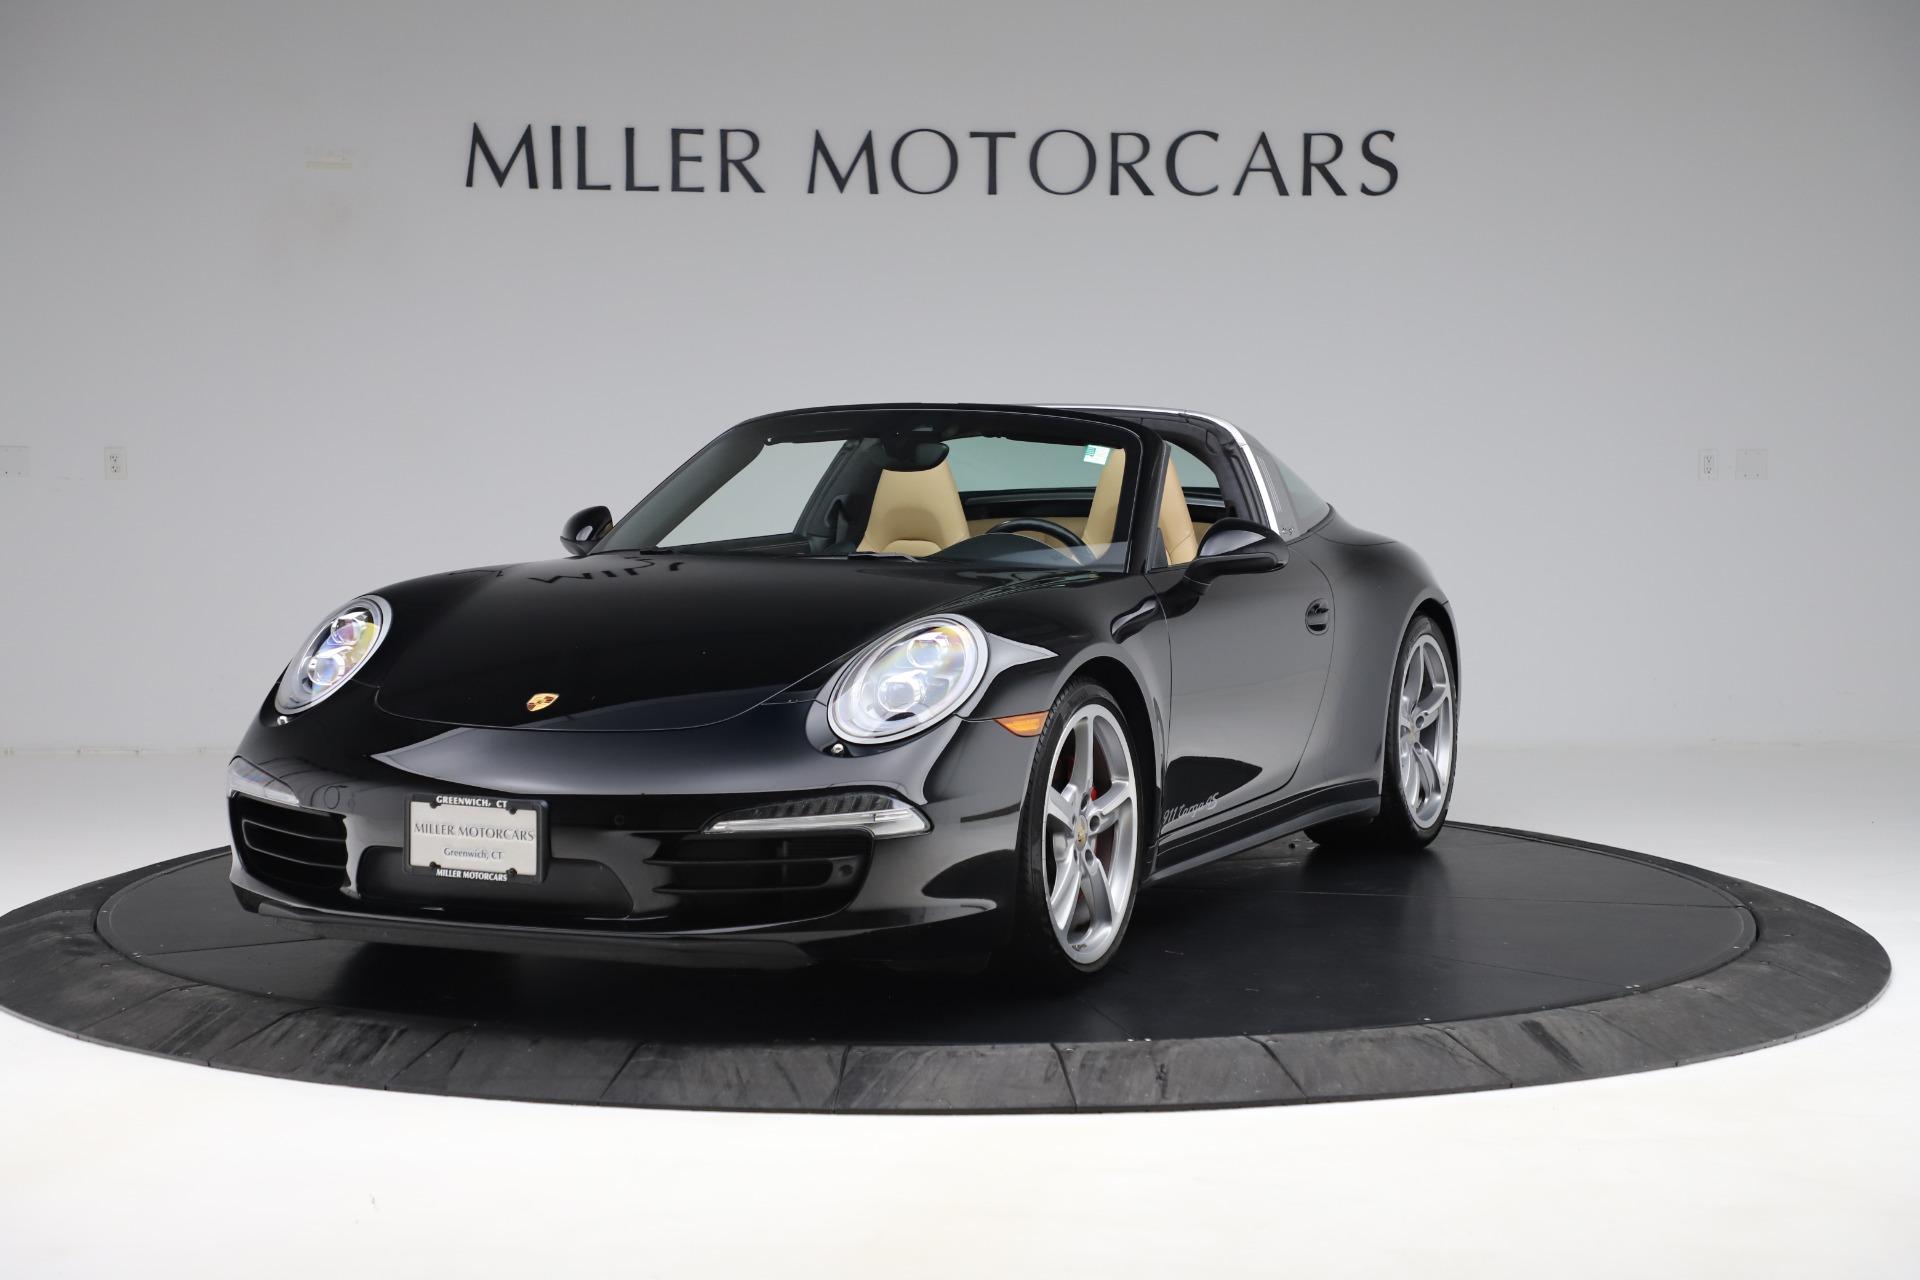 Used 2016 Porsche 911 Targa 4S for sale Sold at Bugatti of Greenwich in Greenwich CT 06830 1